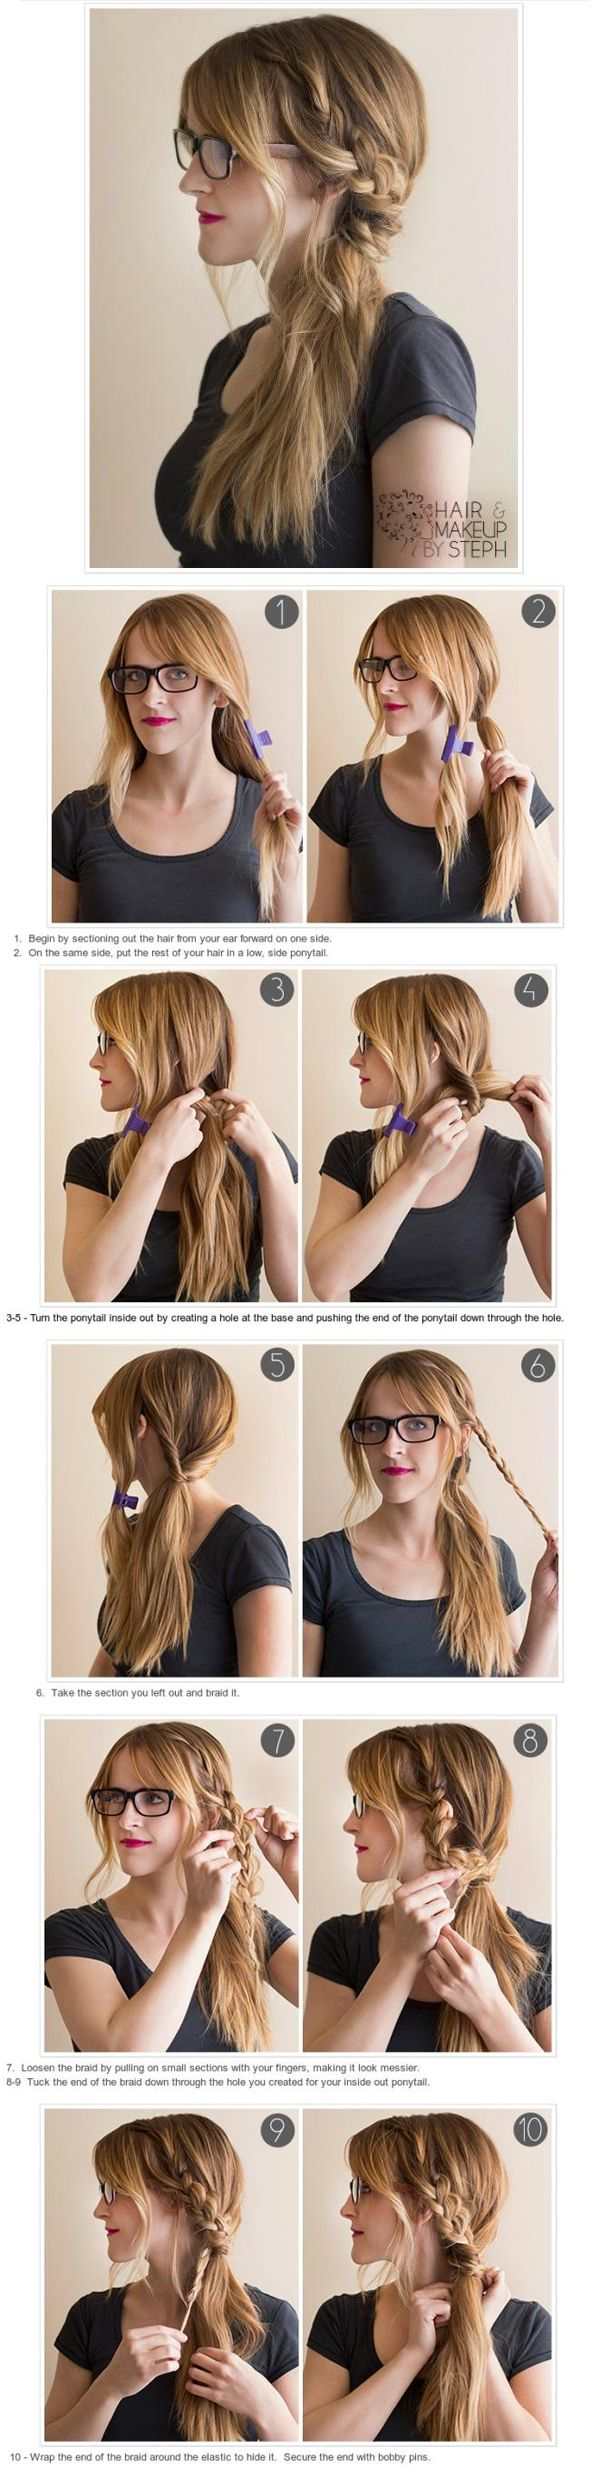 Enjoyable 1000 Ideas About Lazy Day Hairstyles On Pinterest Full Ponytail Short Hairstyles For Black Women Fulllsitofus